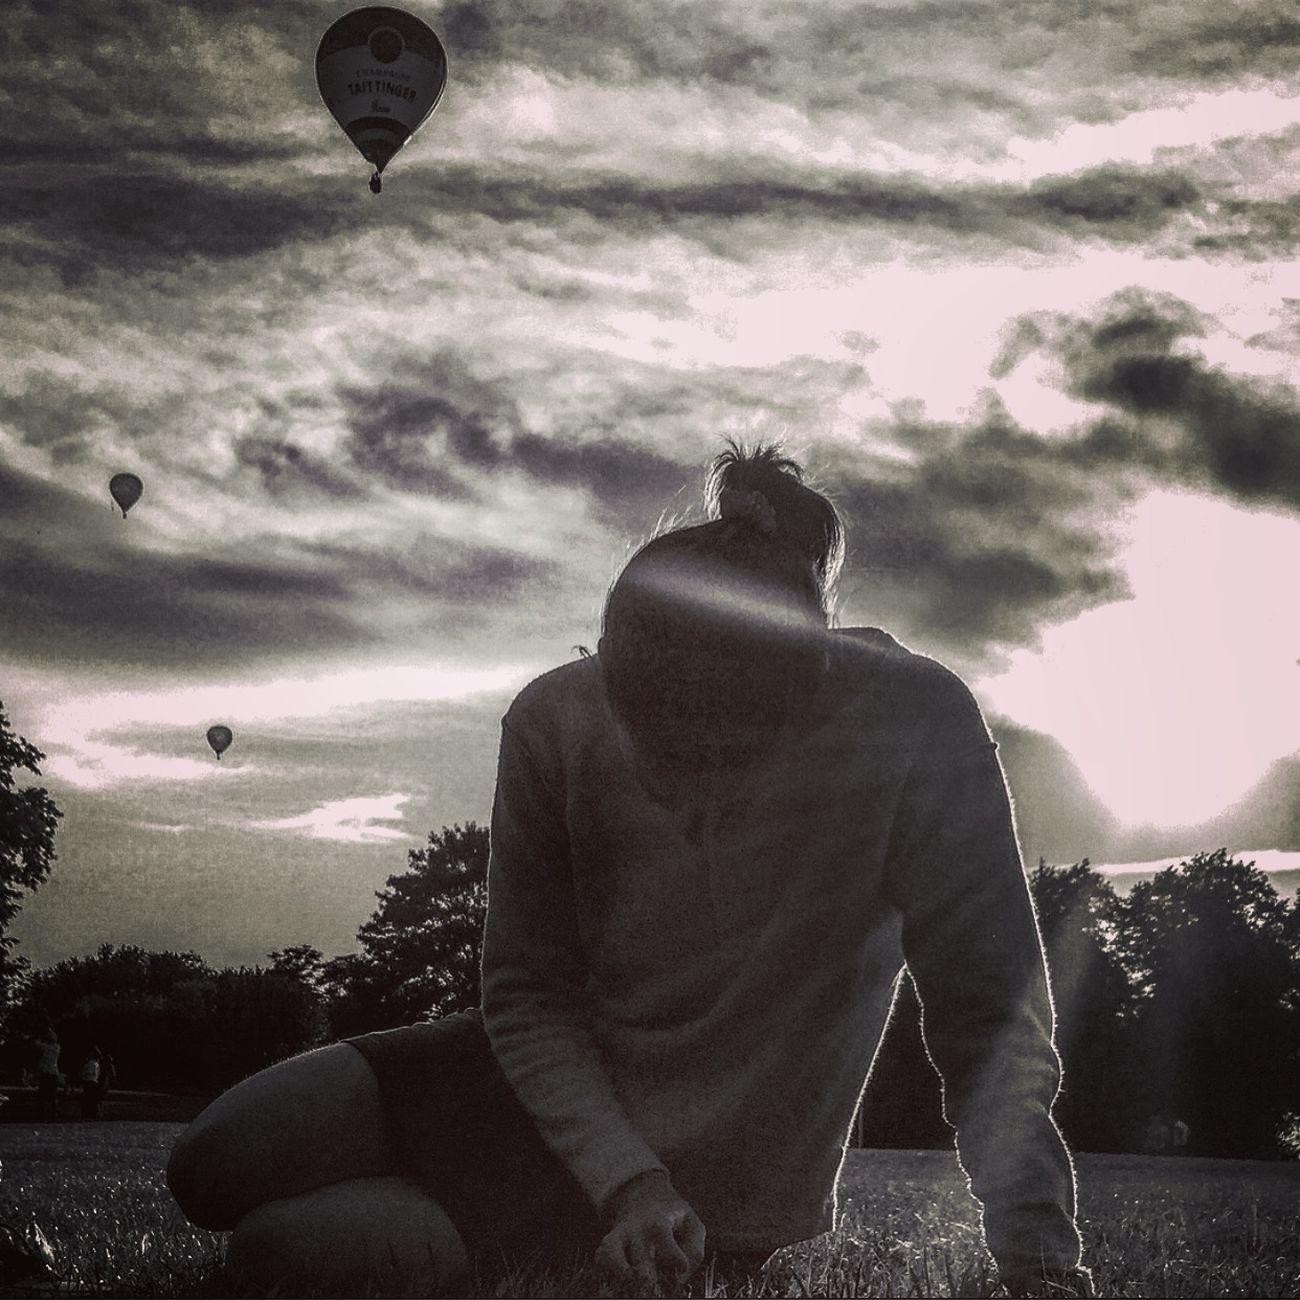 Blissfully unaware of the balloon fiesta overhead. BW Portrait Blackandwhite Balloons Hotairballoons Park Clouds Clouds And Sky Balloonfiesta  Bristol